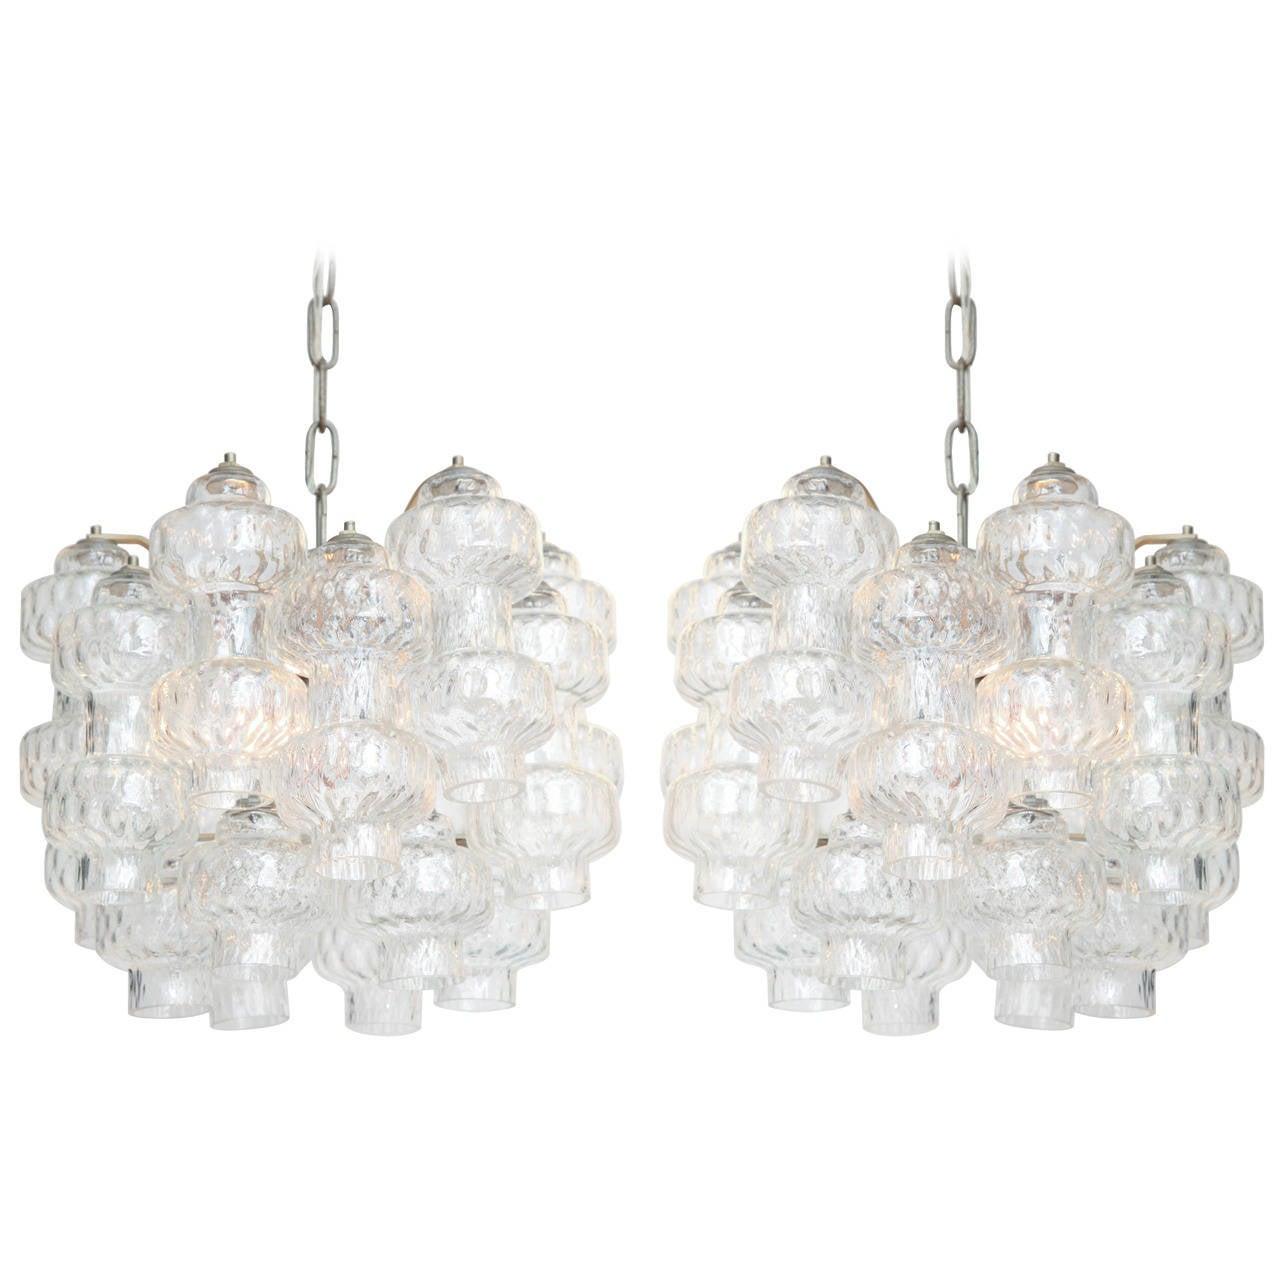 Pair of Carlo Scarpa Style Murano Glass and Chrome Pendants 1